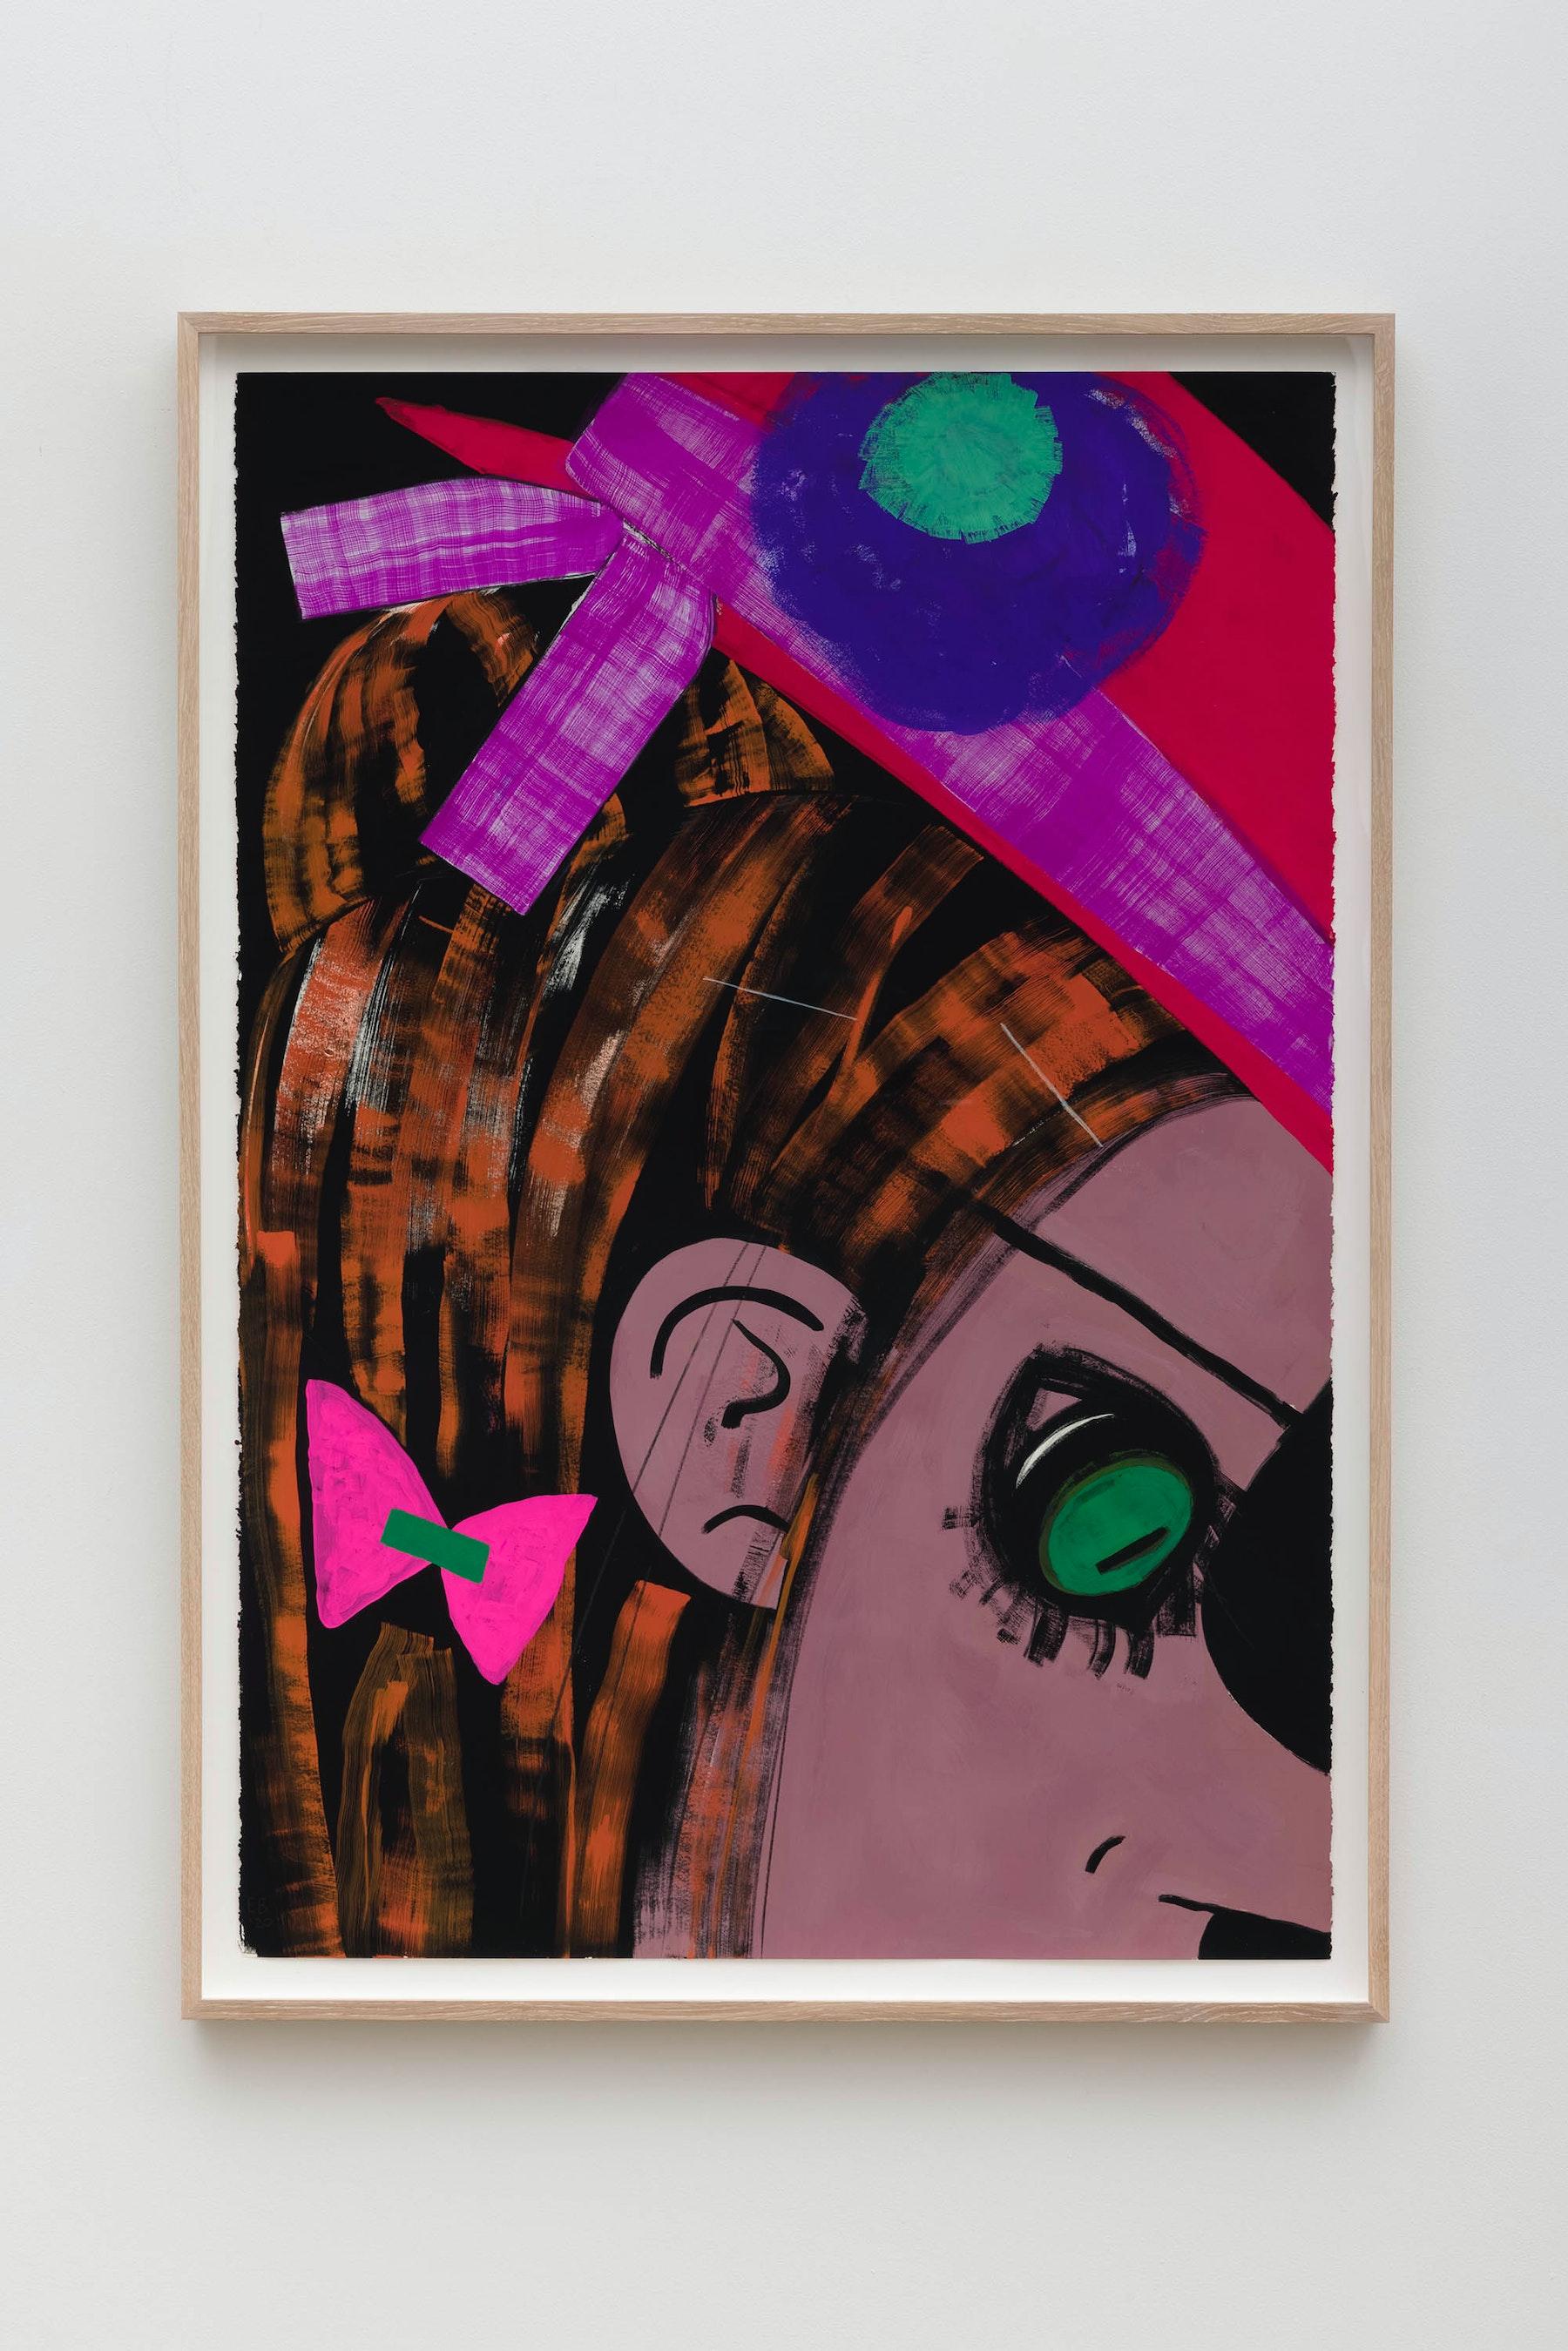 "Ellen Berkenblit ""Green and Pink Plastic Moth,"" 2020 Gouache and graphite on Legion Stonehenge paper 47"" x 33 ¹⁄₄"" x 2"" [HxWxD] (119.38 x 84.45 x 5.08 cm), framed Inventory #BER210 Courtesy of the artist and Vielmetter Los Angeles Photo credit: Jeff McLane"